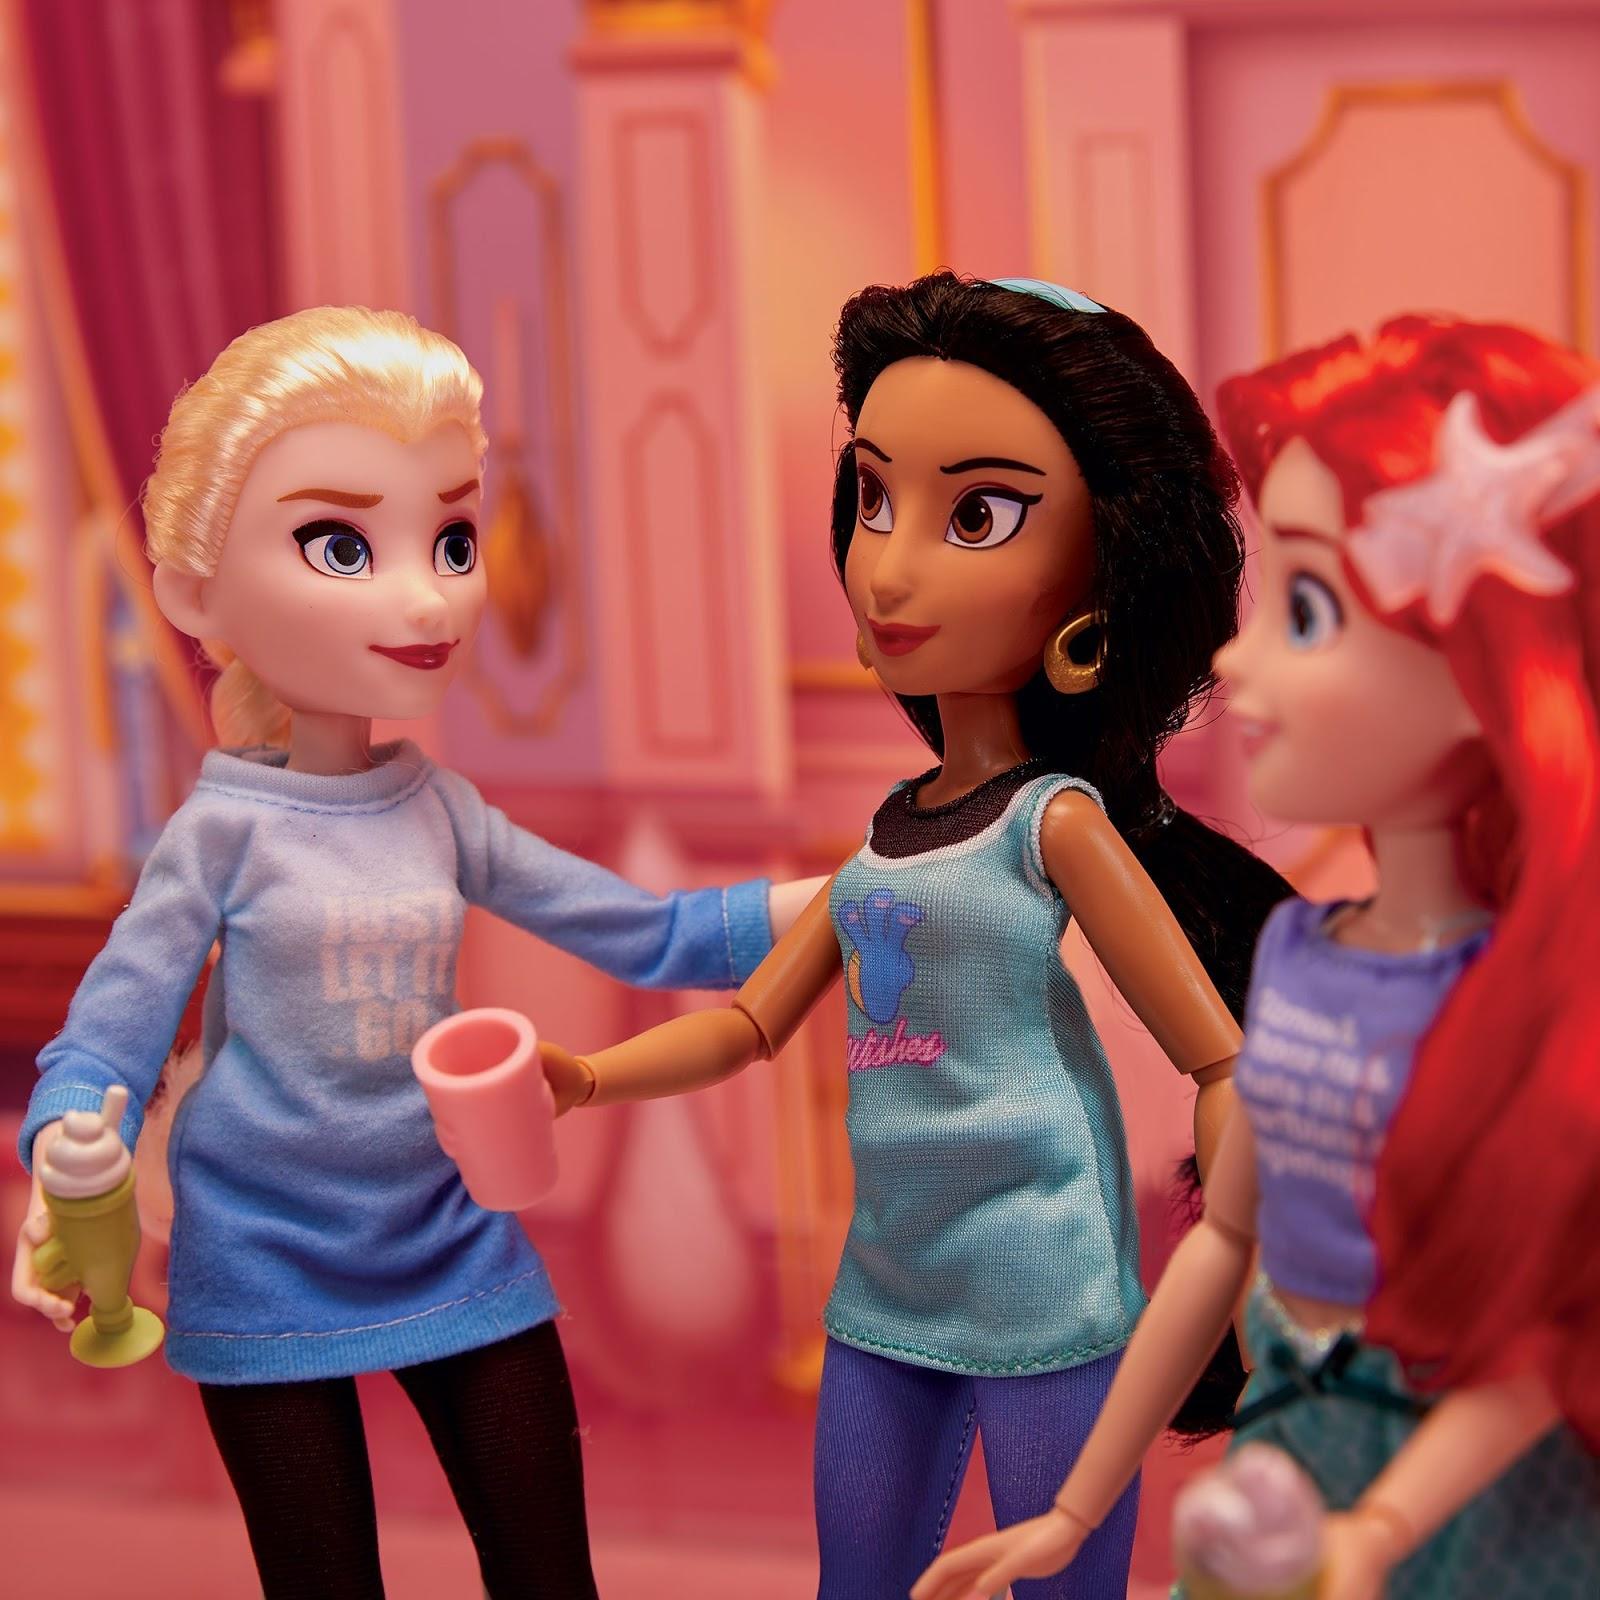 Hasbro Debuts Quot Ralph Breaks The Internet Quot Princess Doll